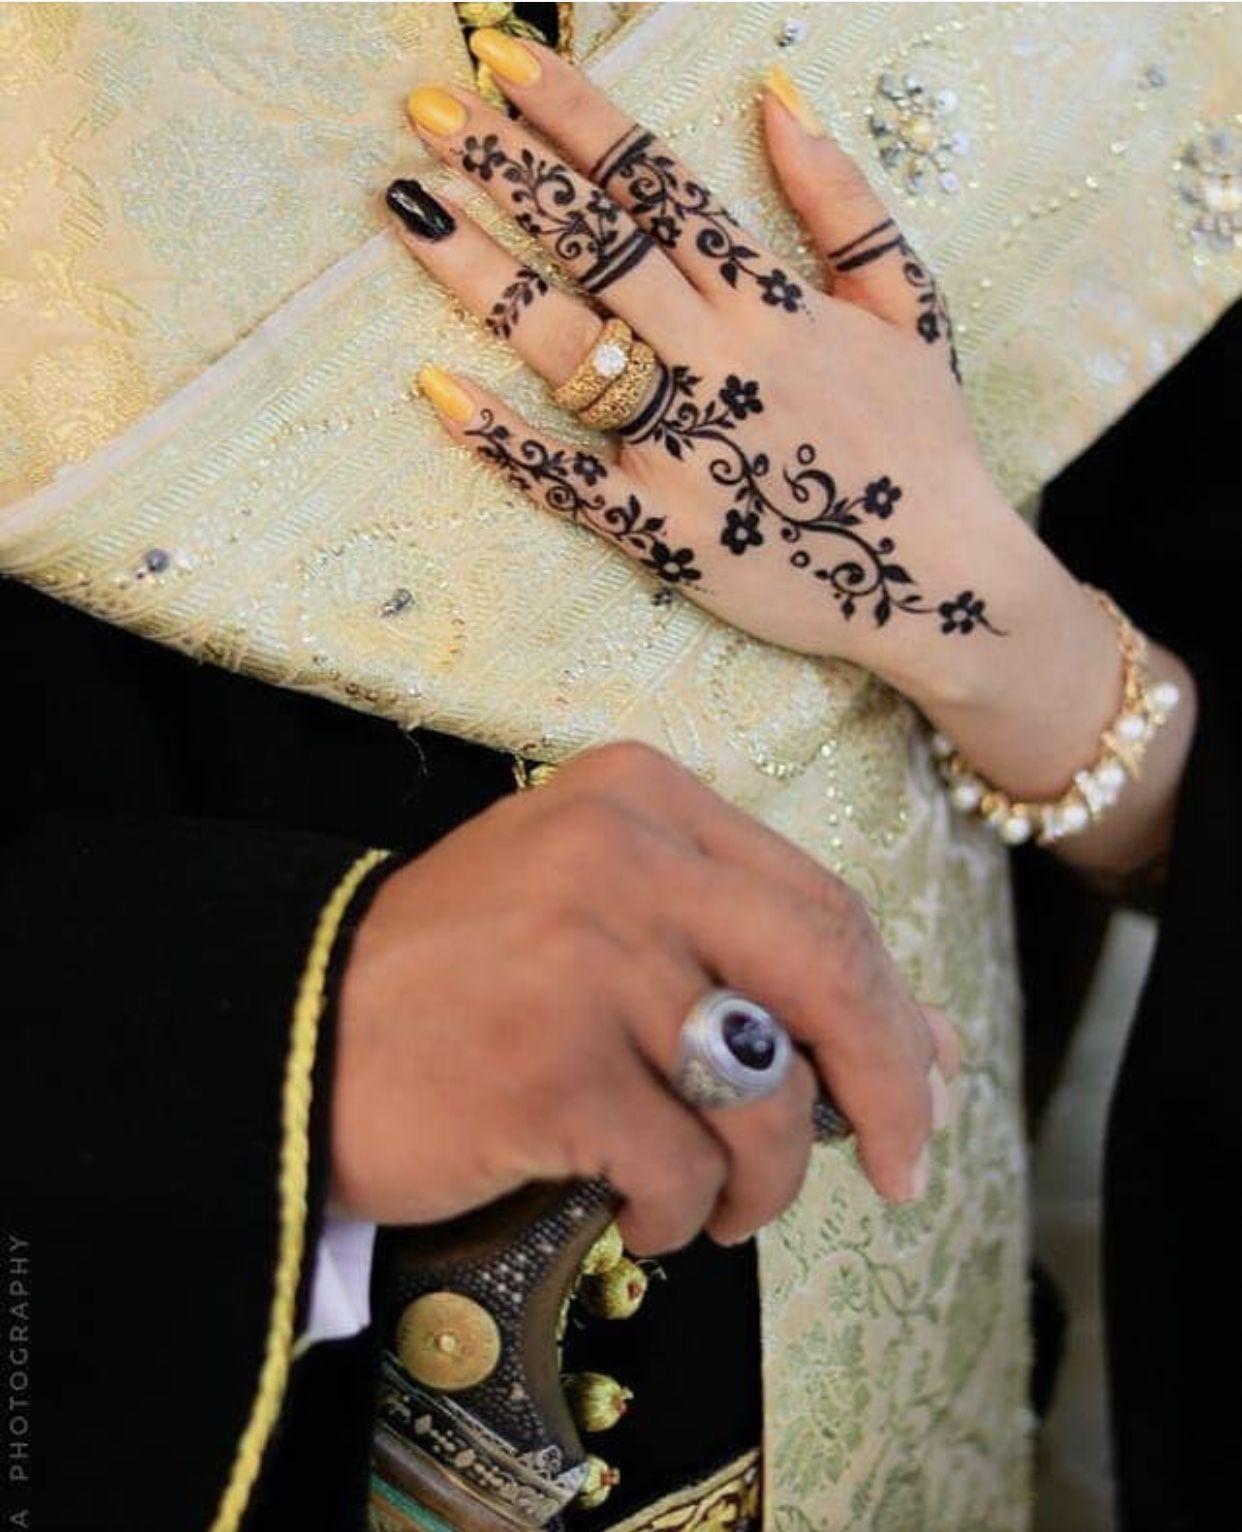 Pin By Ana الـرمـانـه On صنعانية يمنيه Basic Mehndi Designs Henna Designs Hand Hand Henna